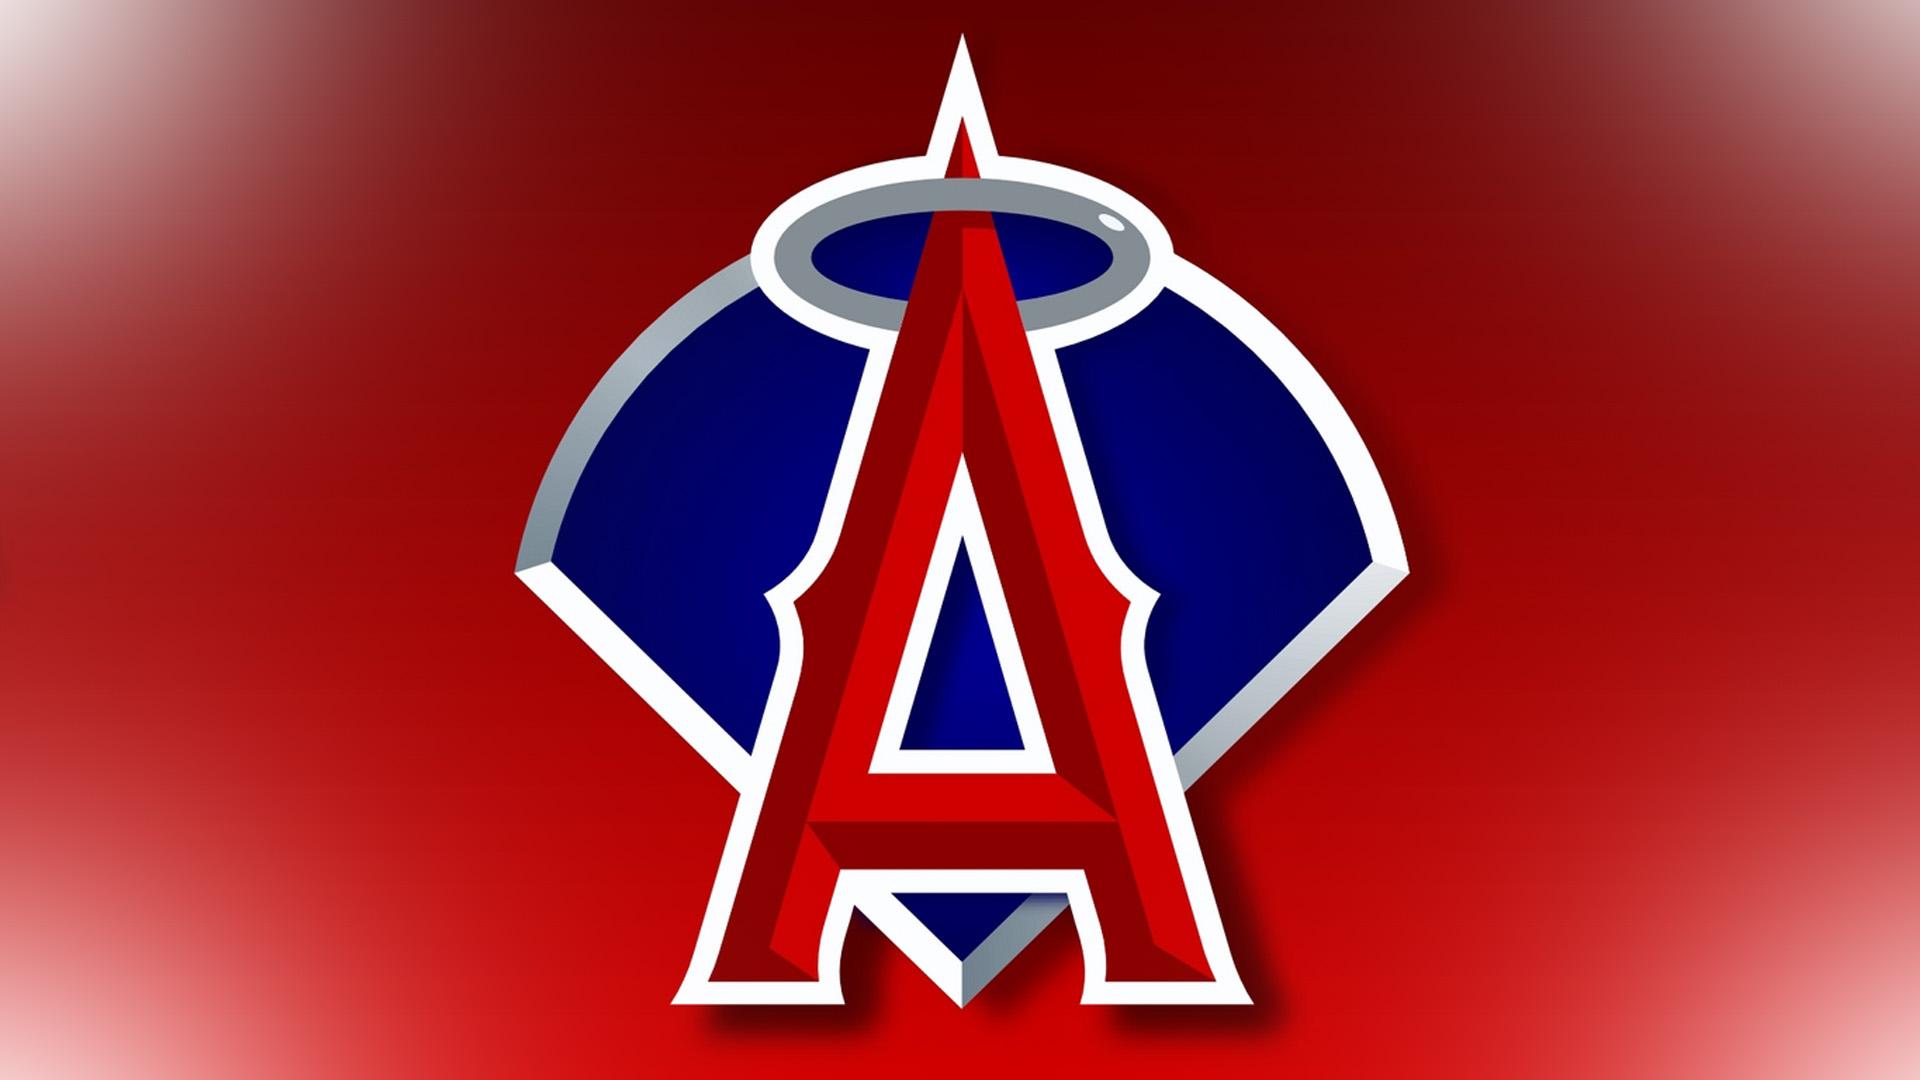 Angels baseball logo images Custom Canvas Online - Cheap Canvas Prints Online Photo